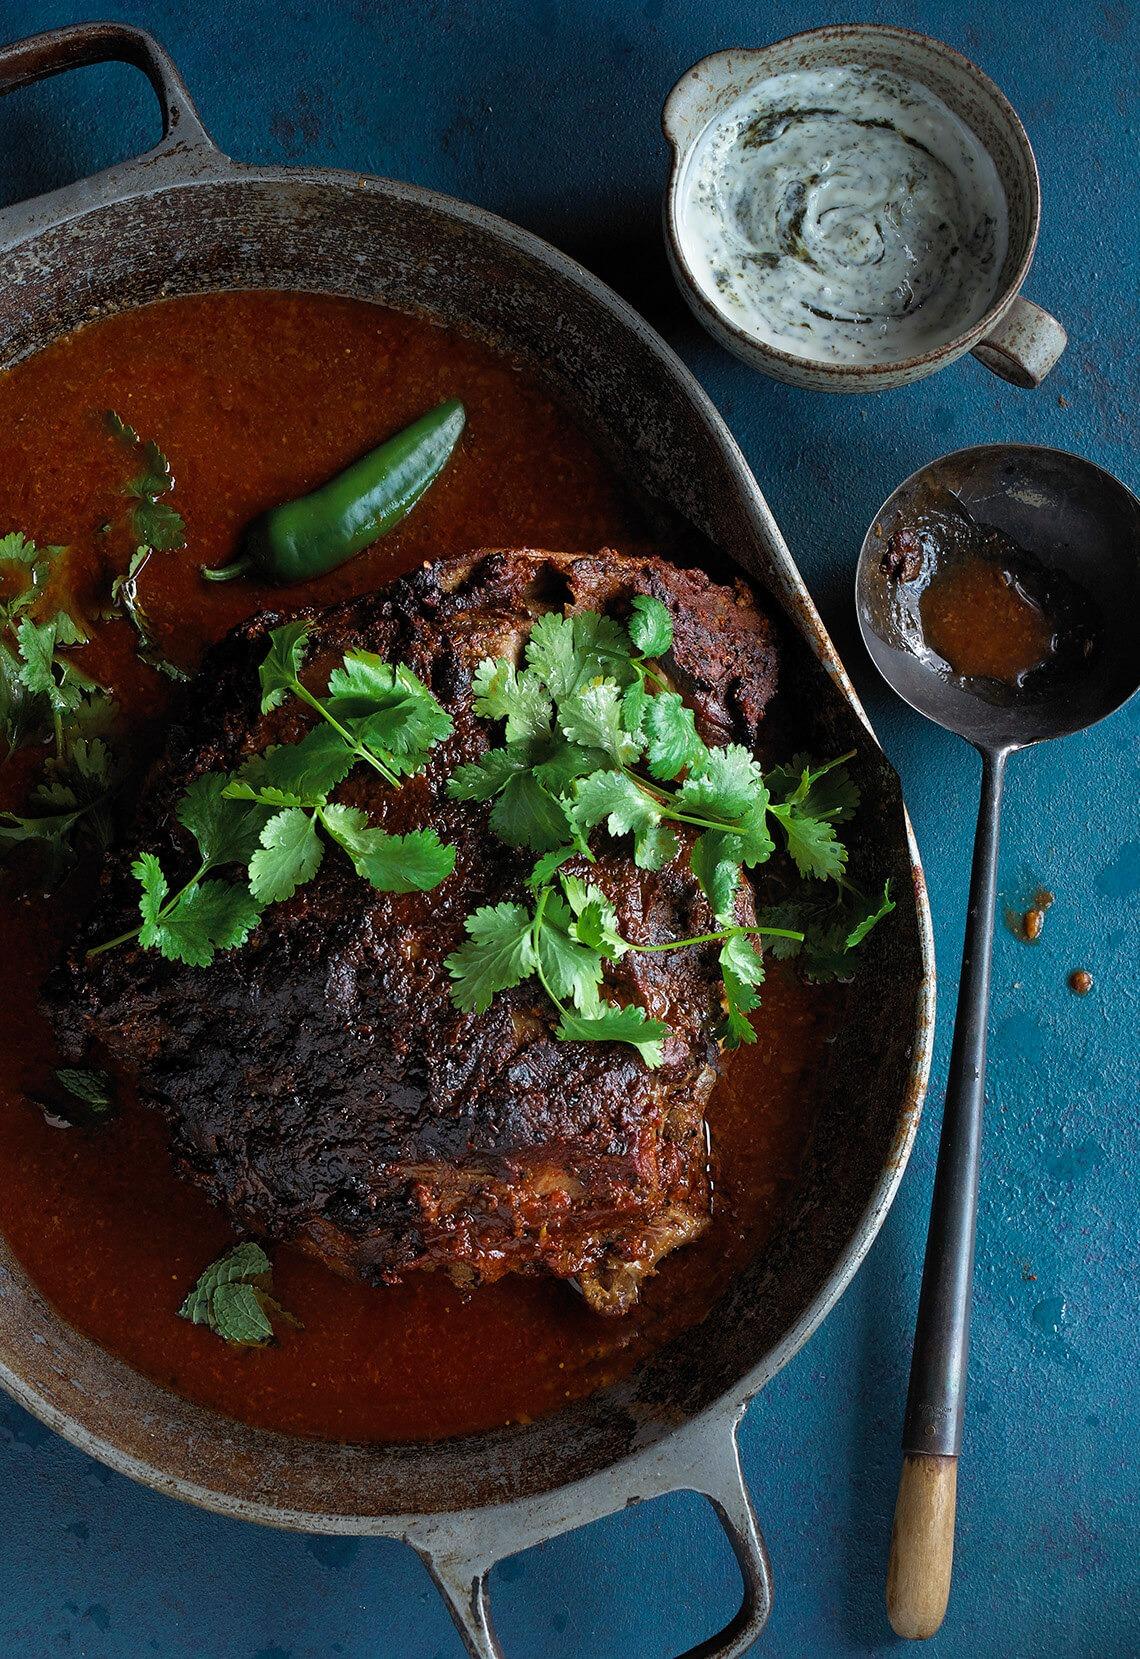 Madras lamb with raita side.